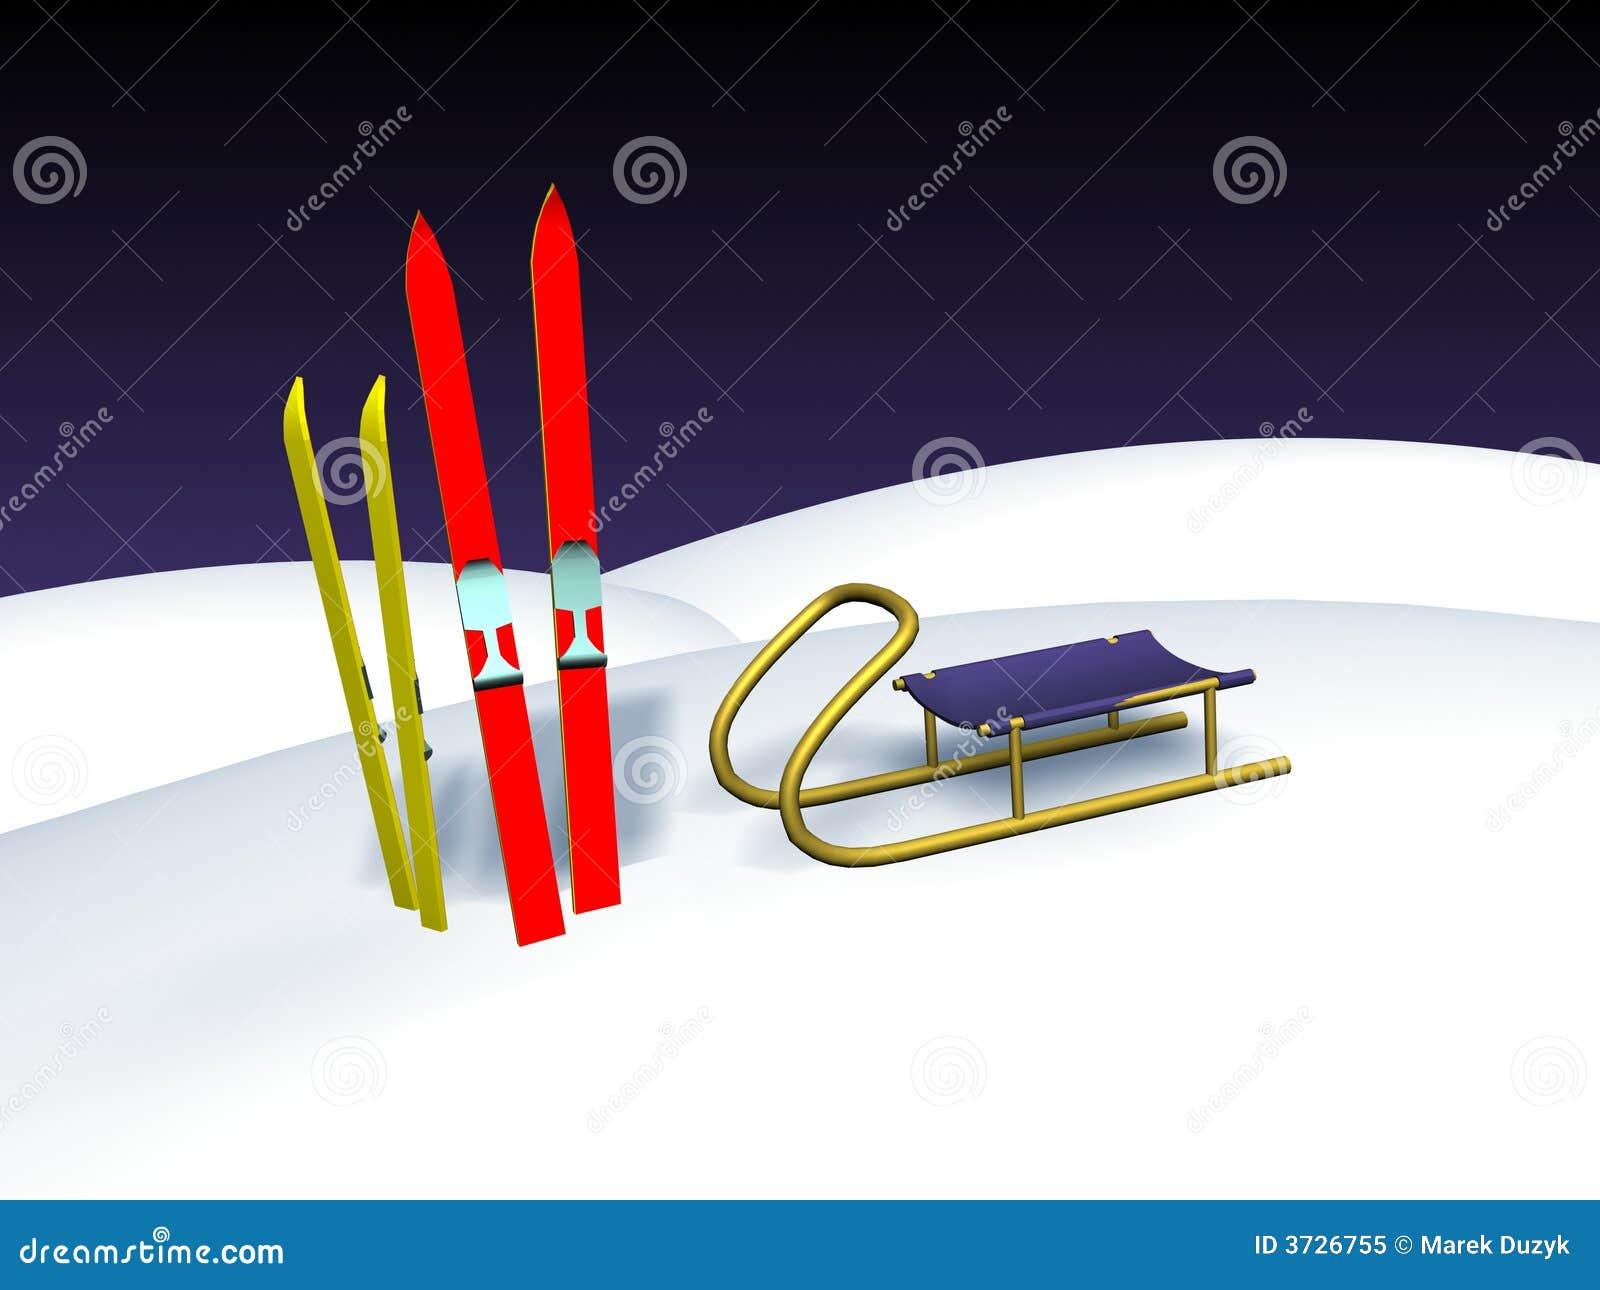 Ski and sledge